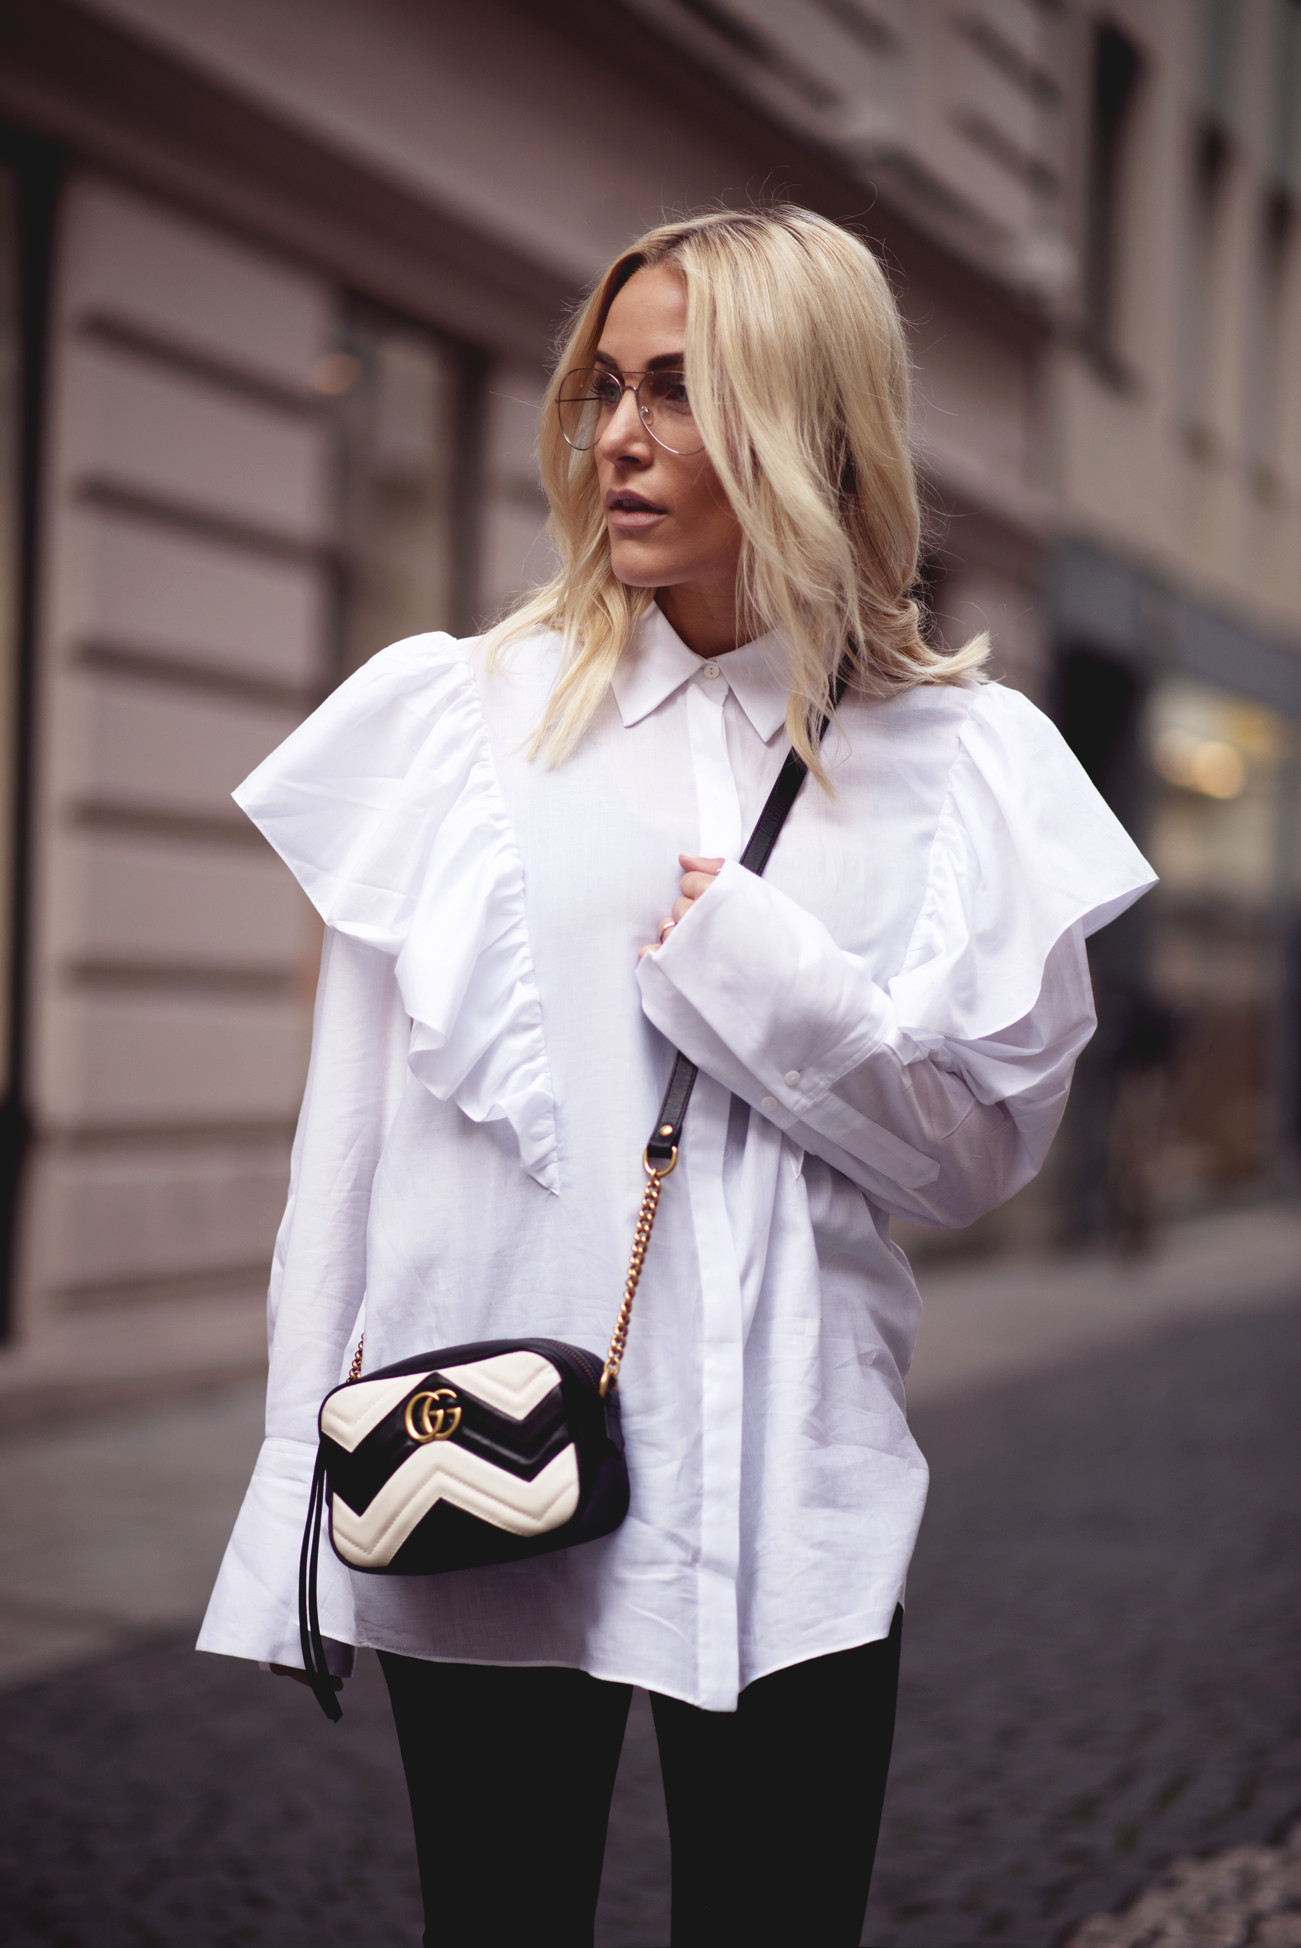 guccimarmont-gucci-fashionblogger-blogger-sequinsophia-munich-2-dsc_2789